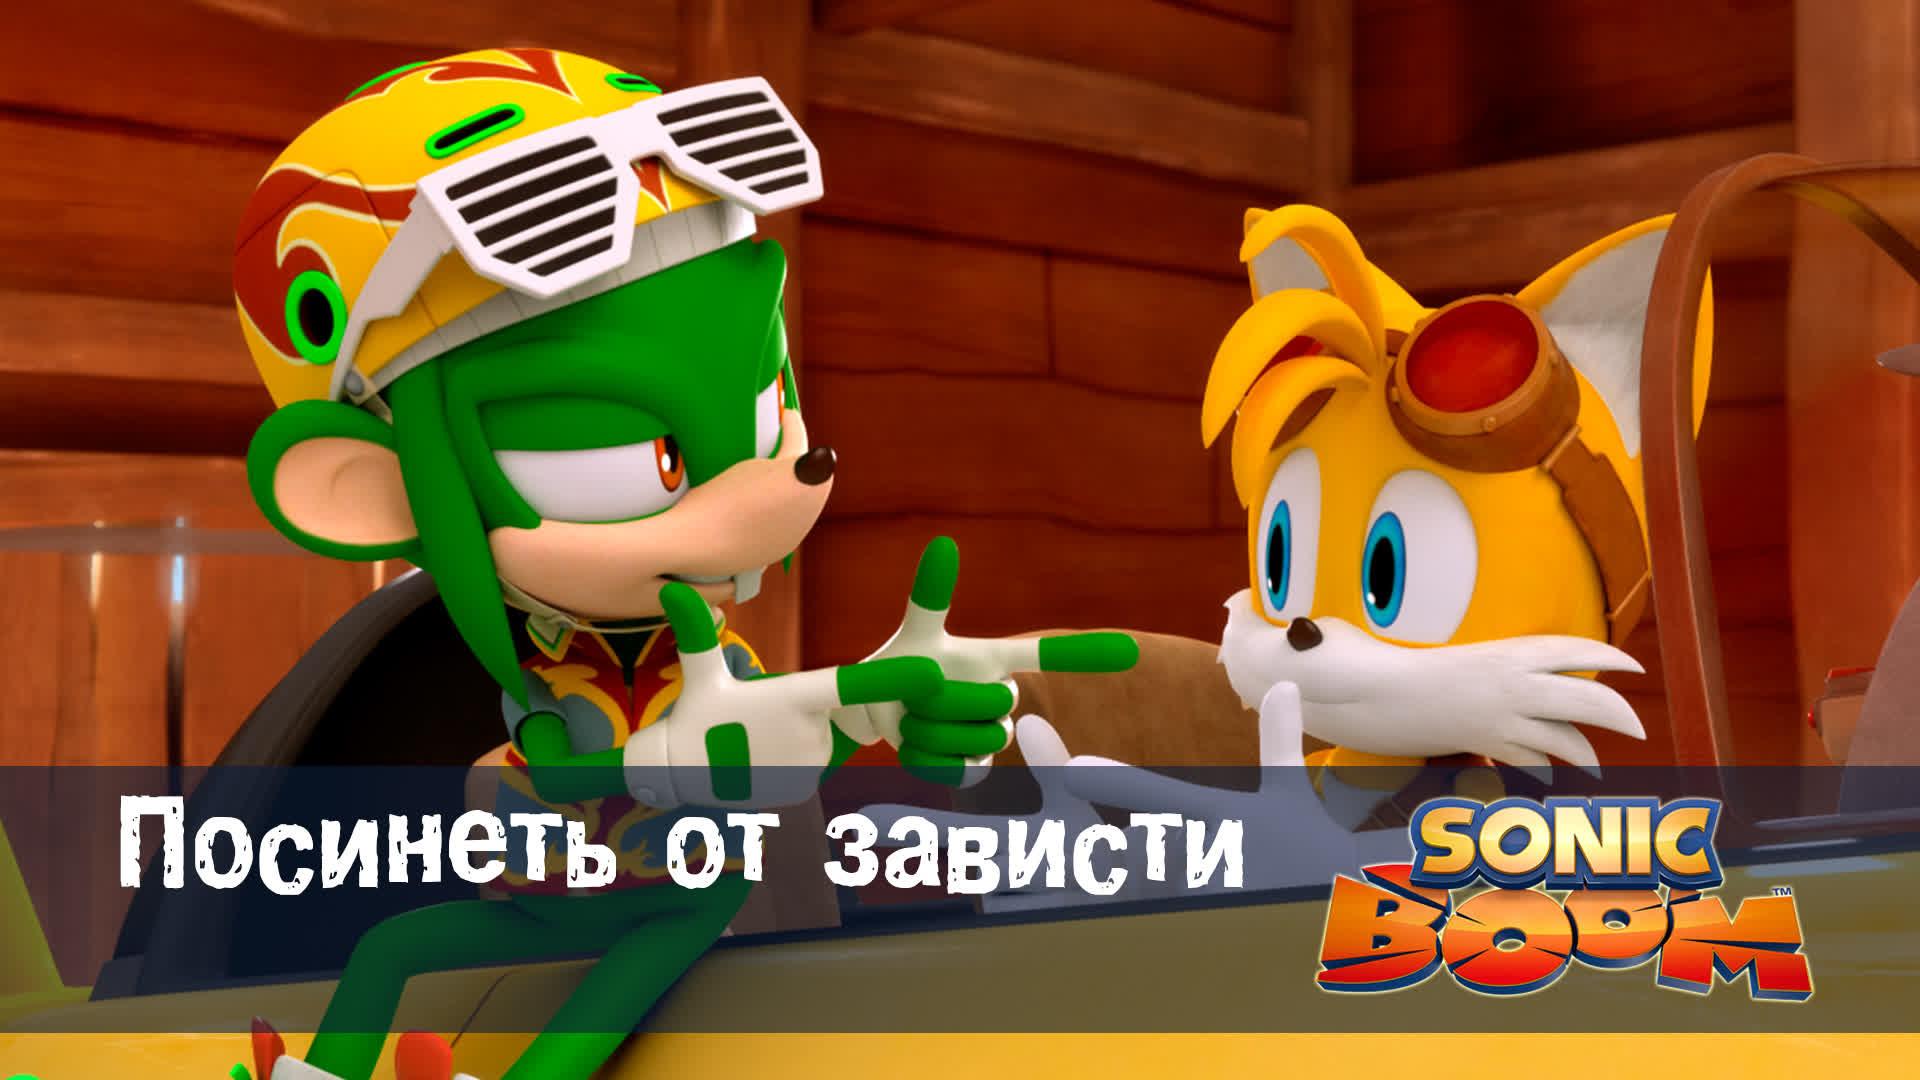 Соник Бум - Серия 28